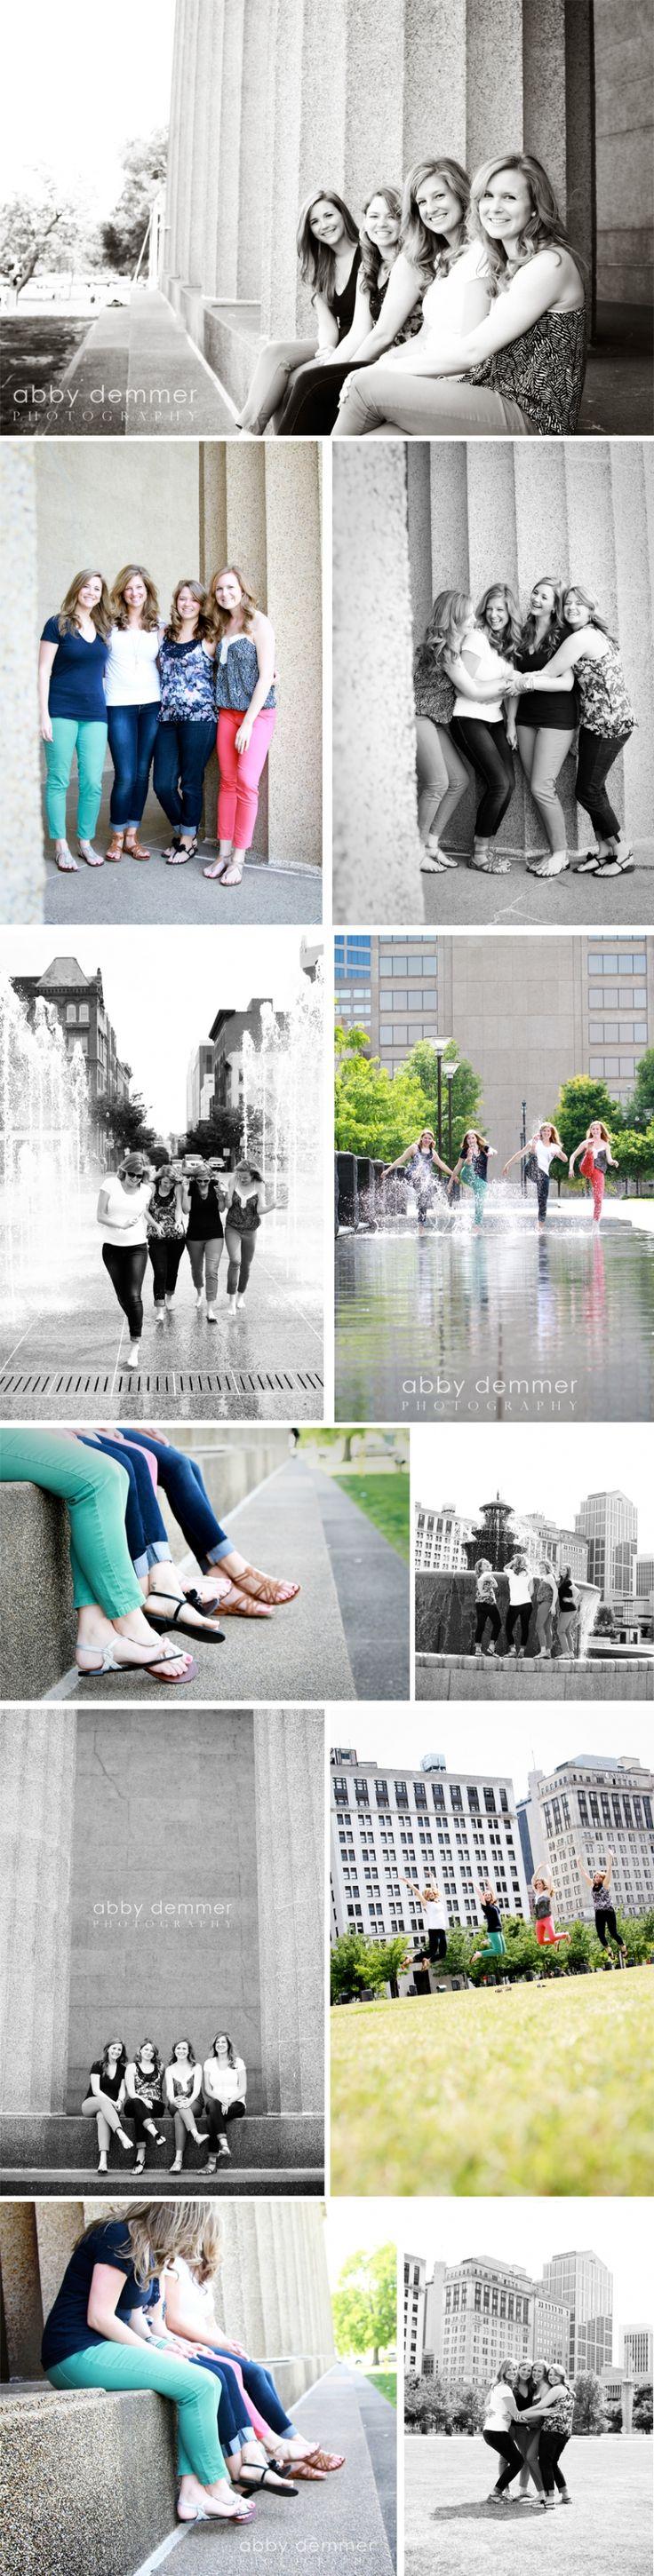 457 best images about picture ideas on pinterest | senior pics